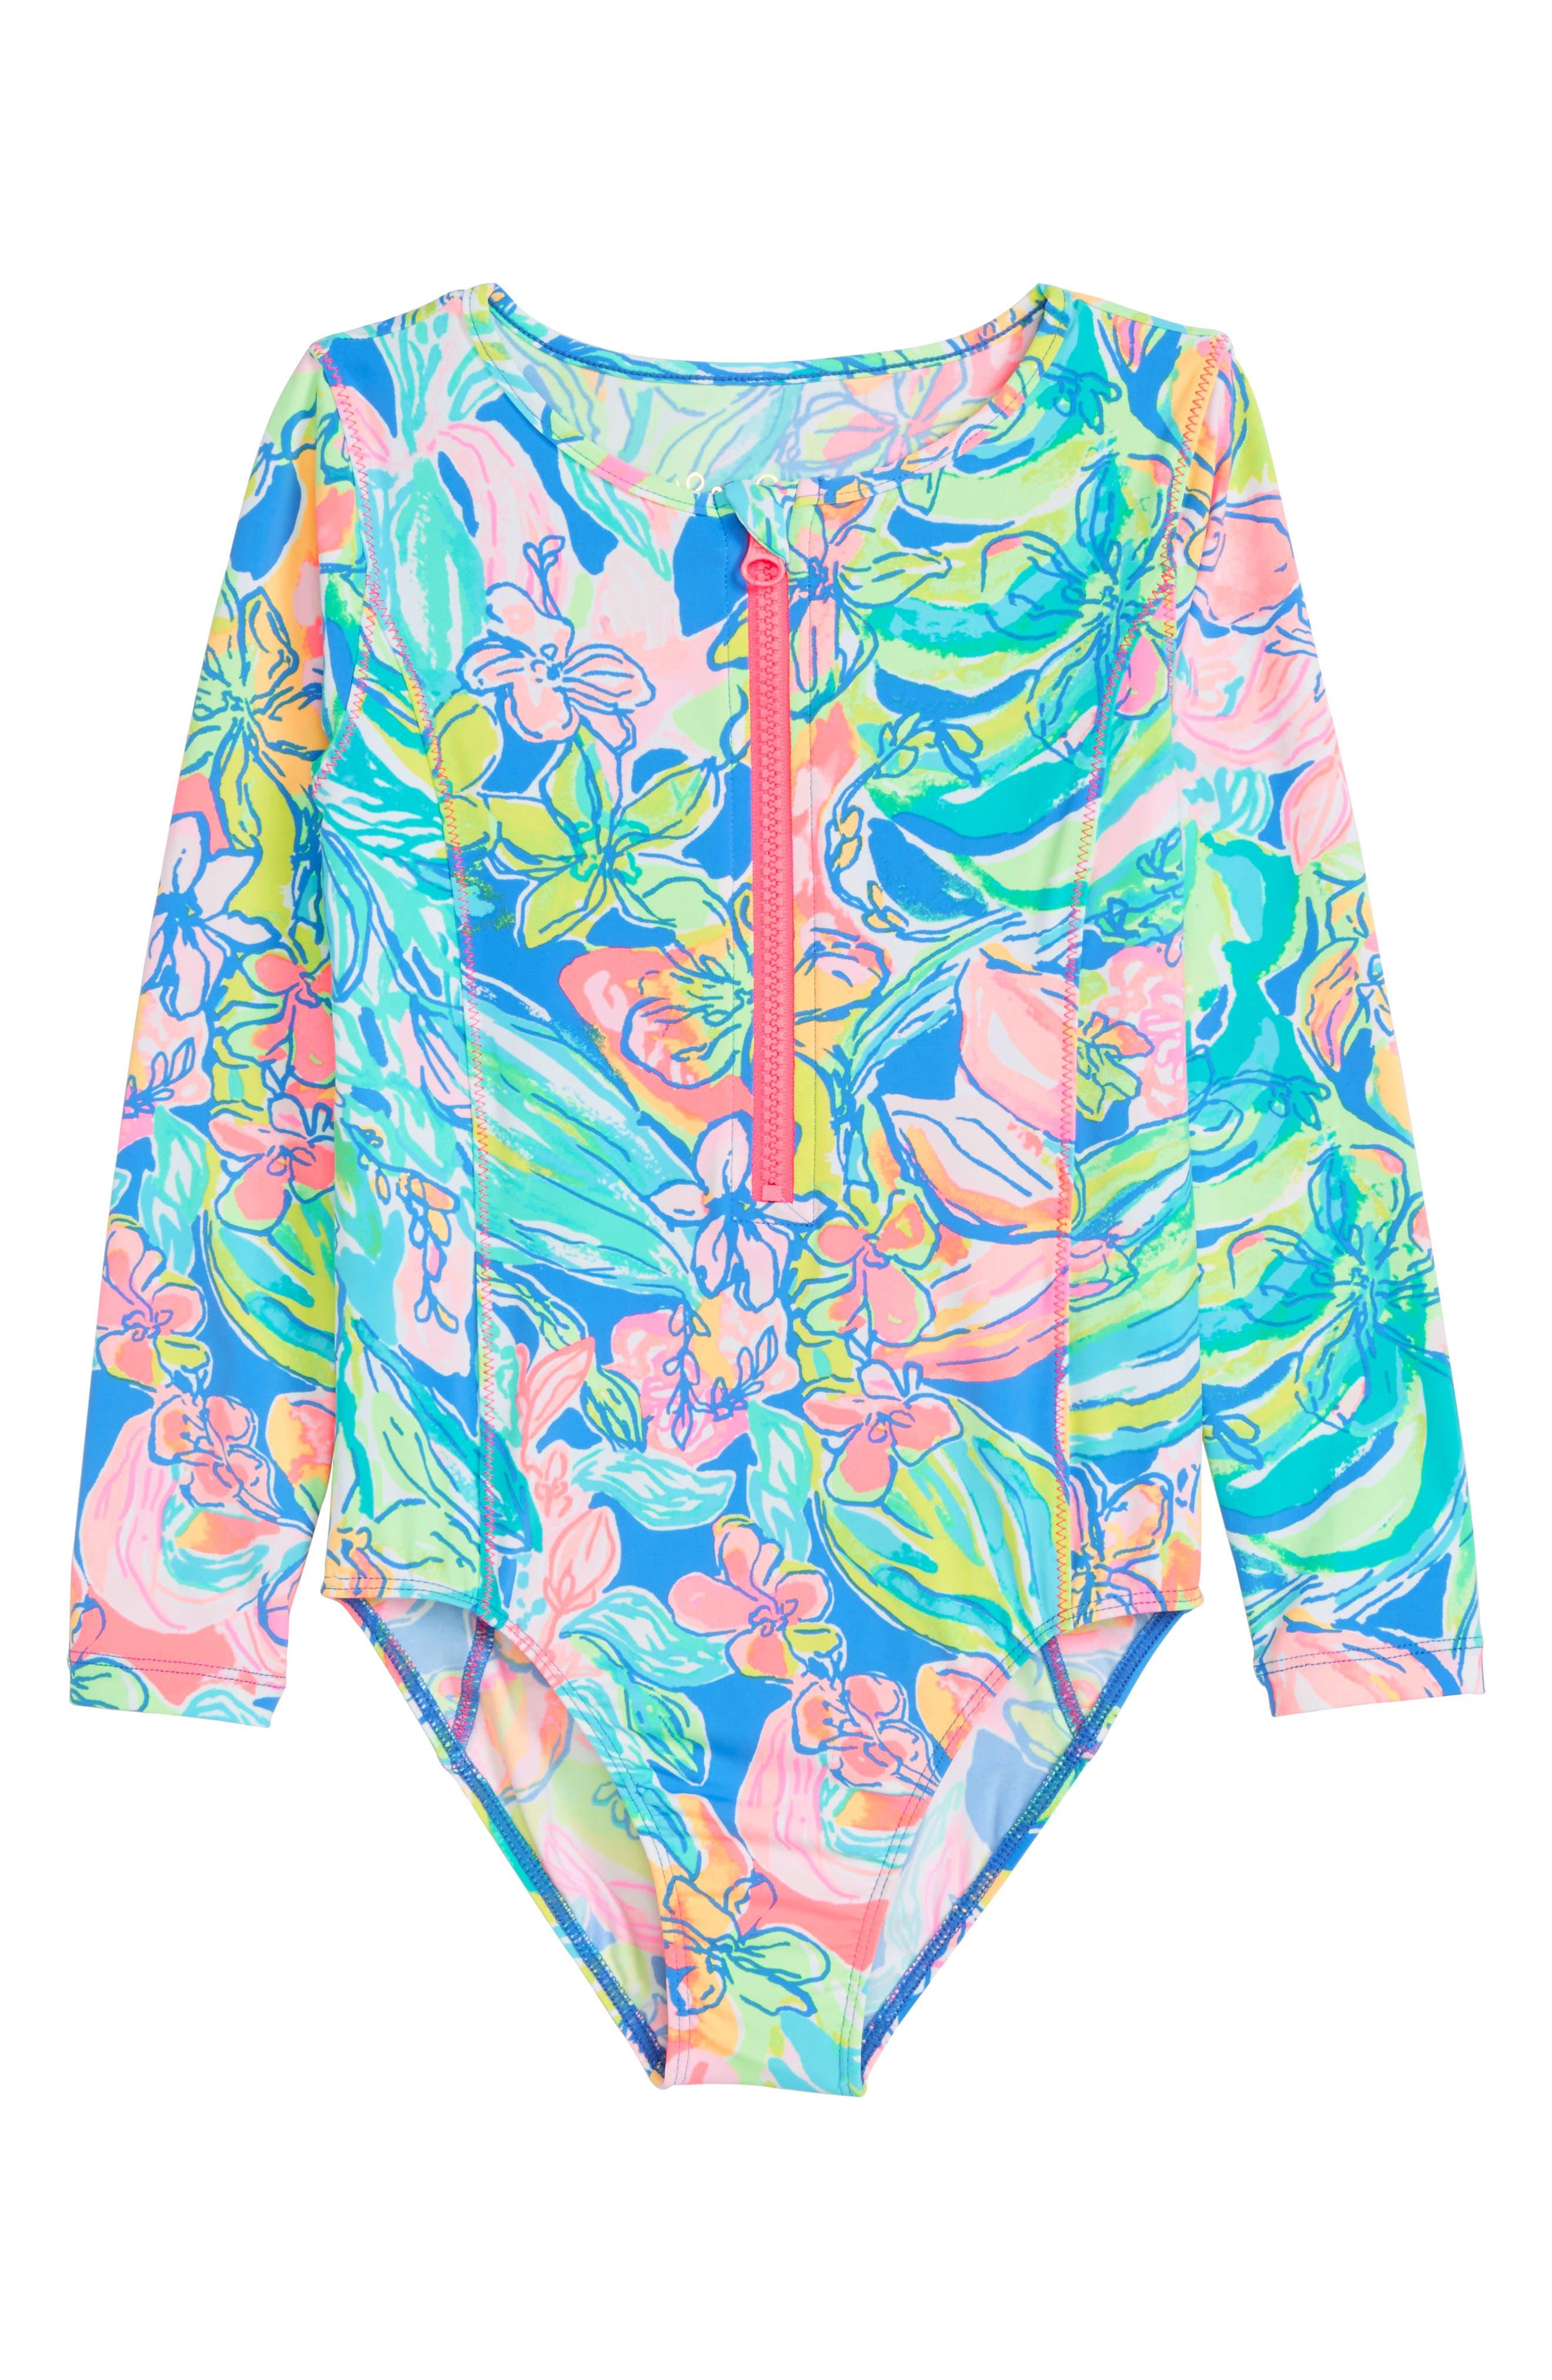 Aliana UPF 50+ One-Piece Rashguard Swimsuit,                         Main,                         color, 420